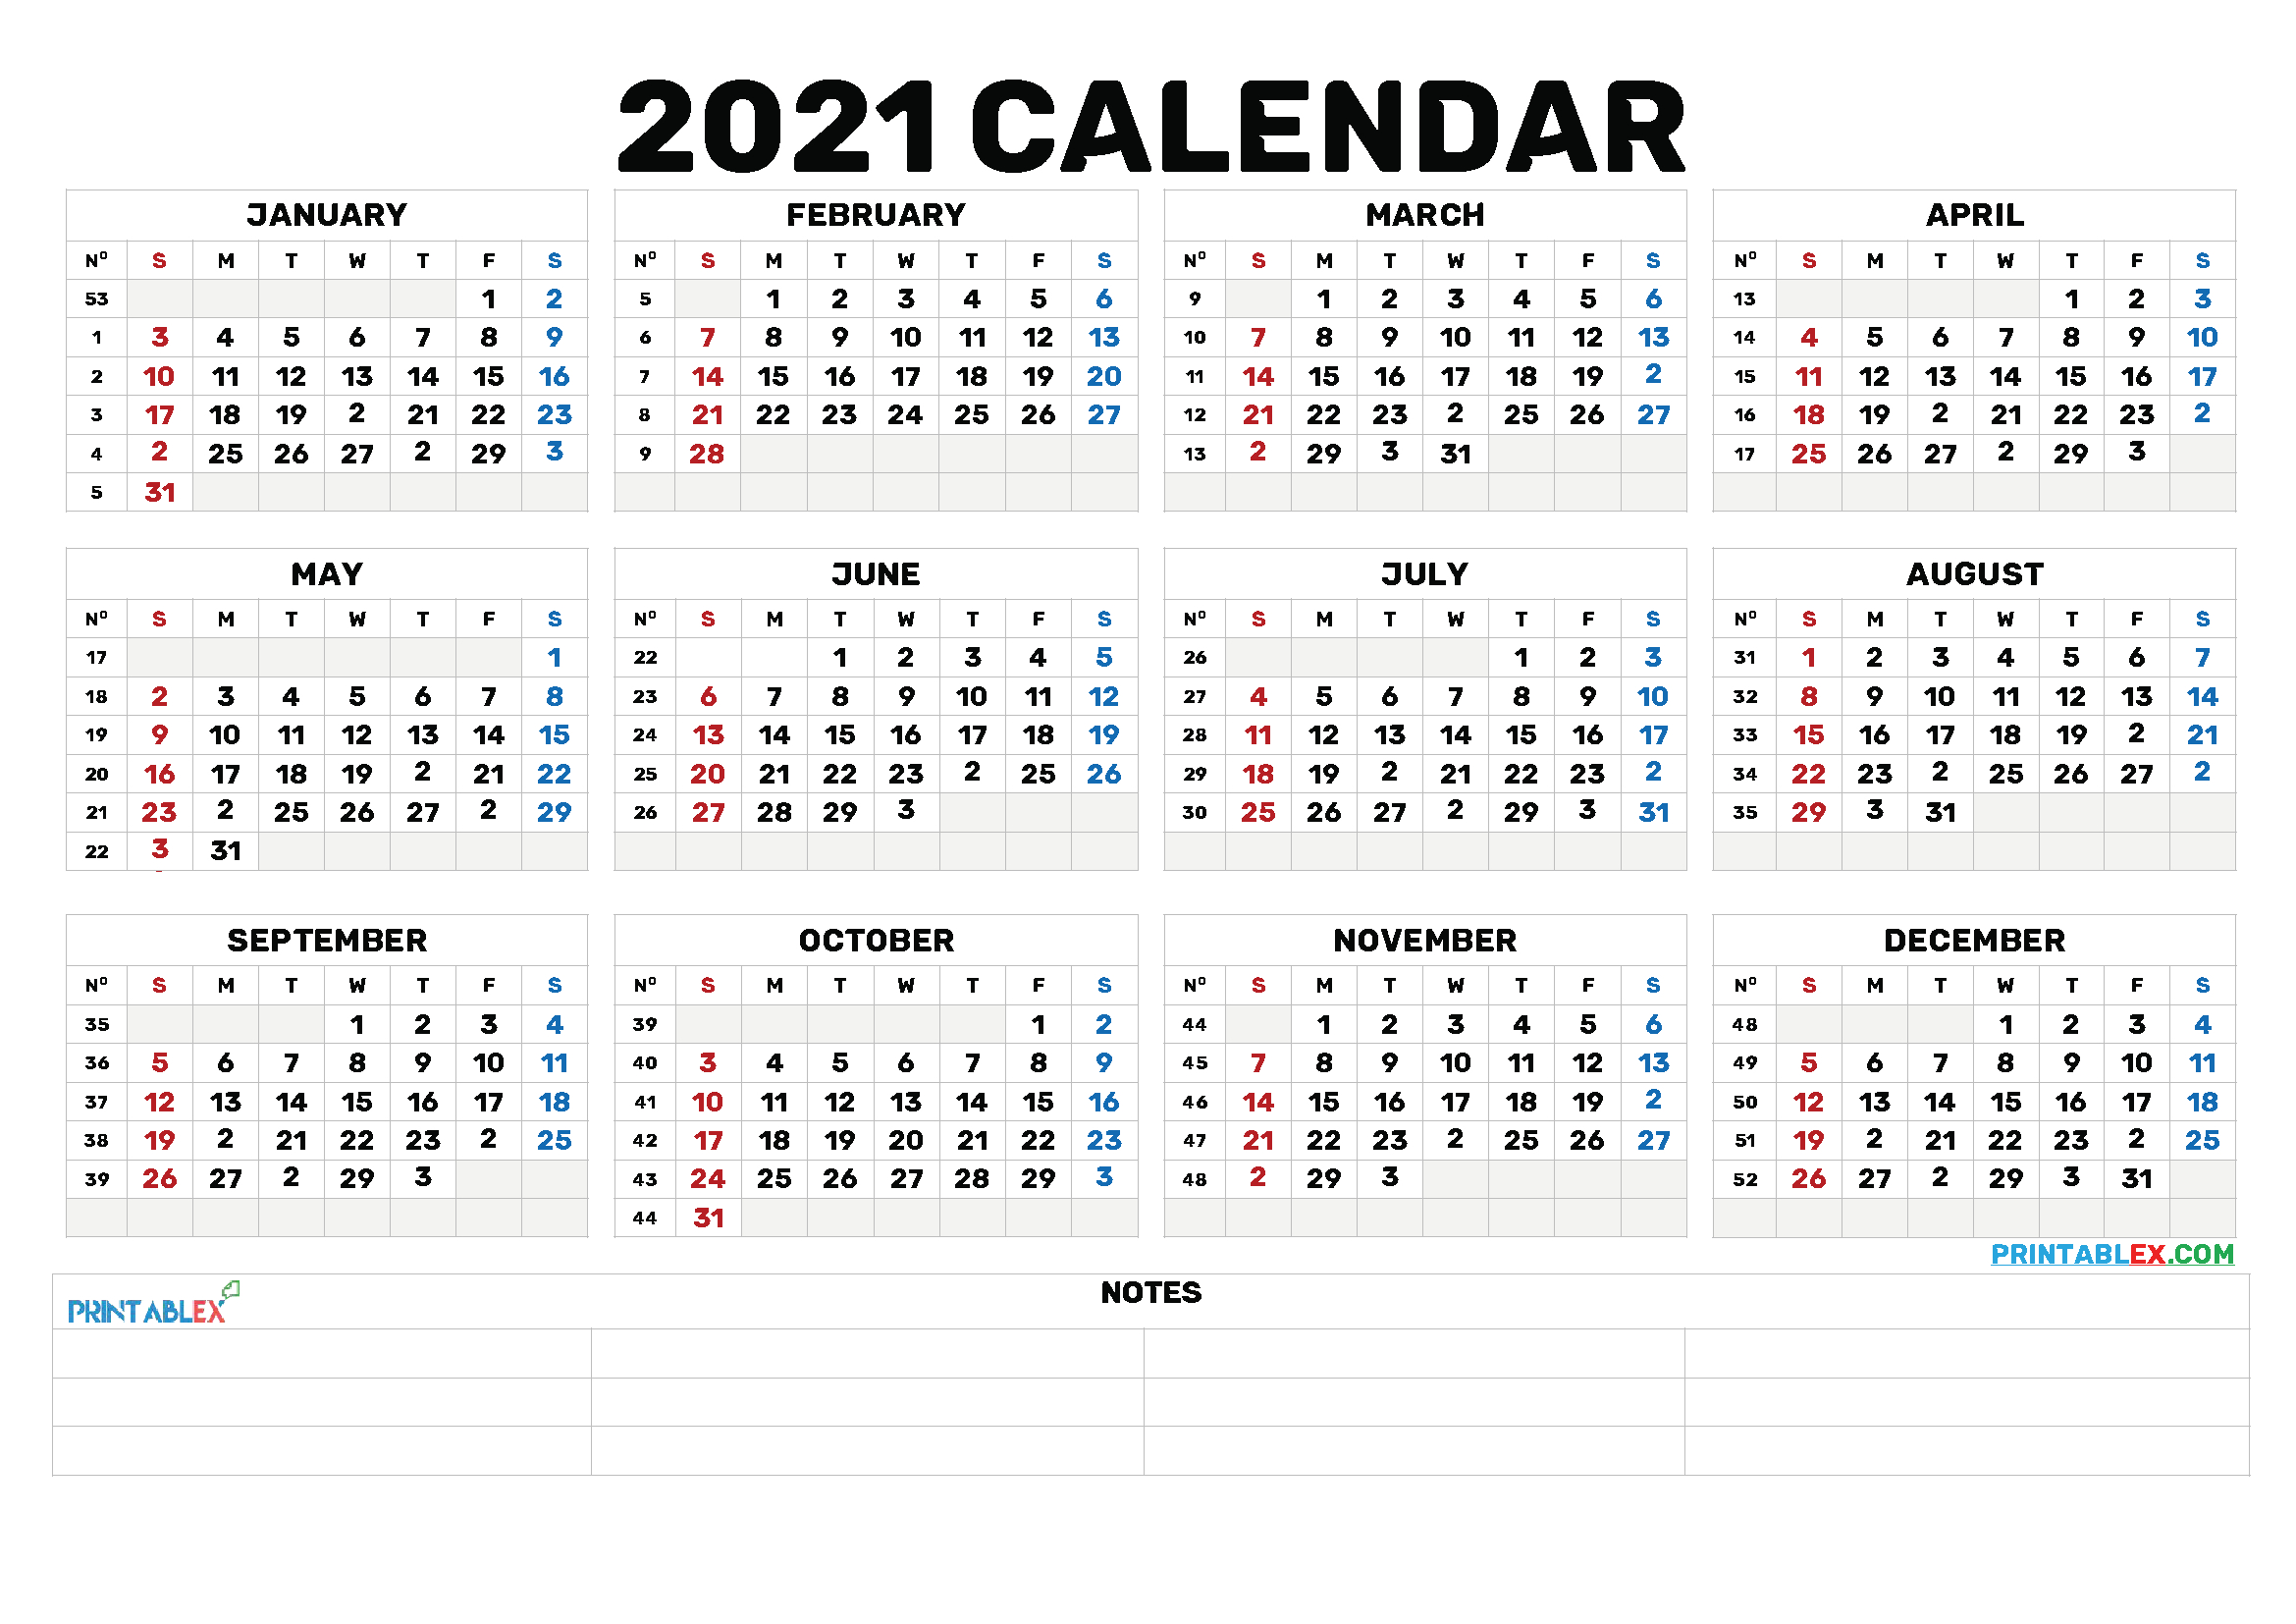 2021 Annual Calendar Printable – 21Ytw173 | Yearly Calendar